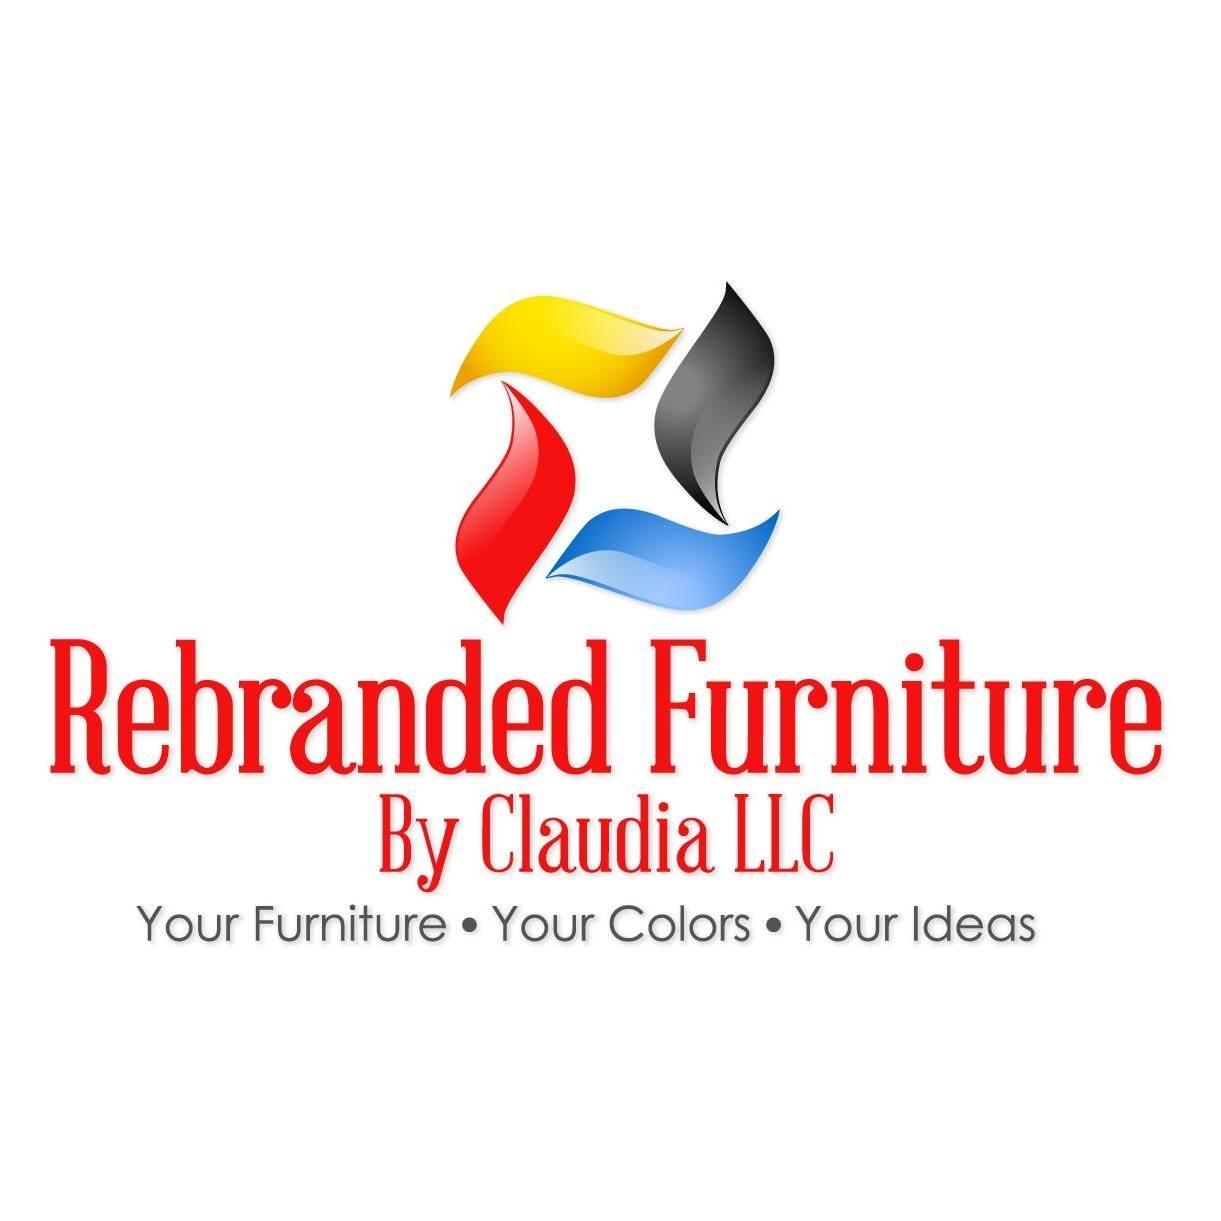 Rebranded Furniture By Claudia LLC